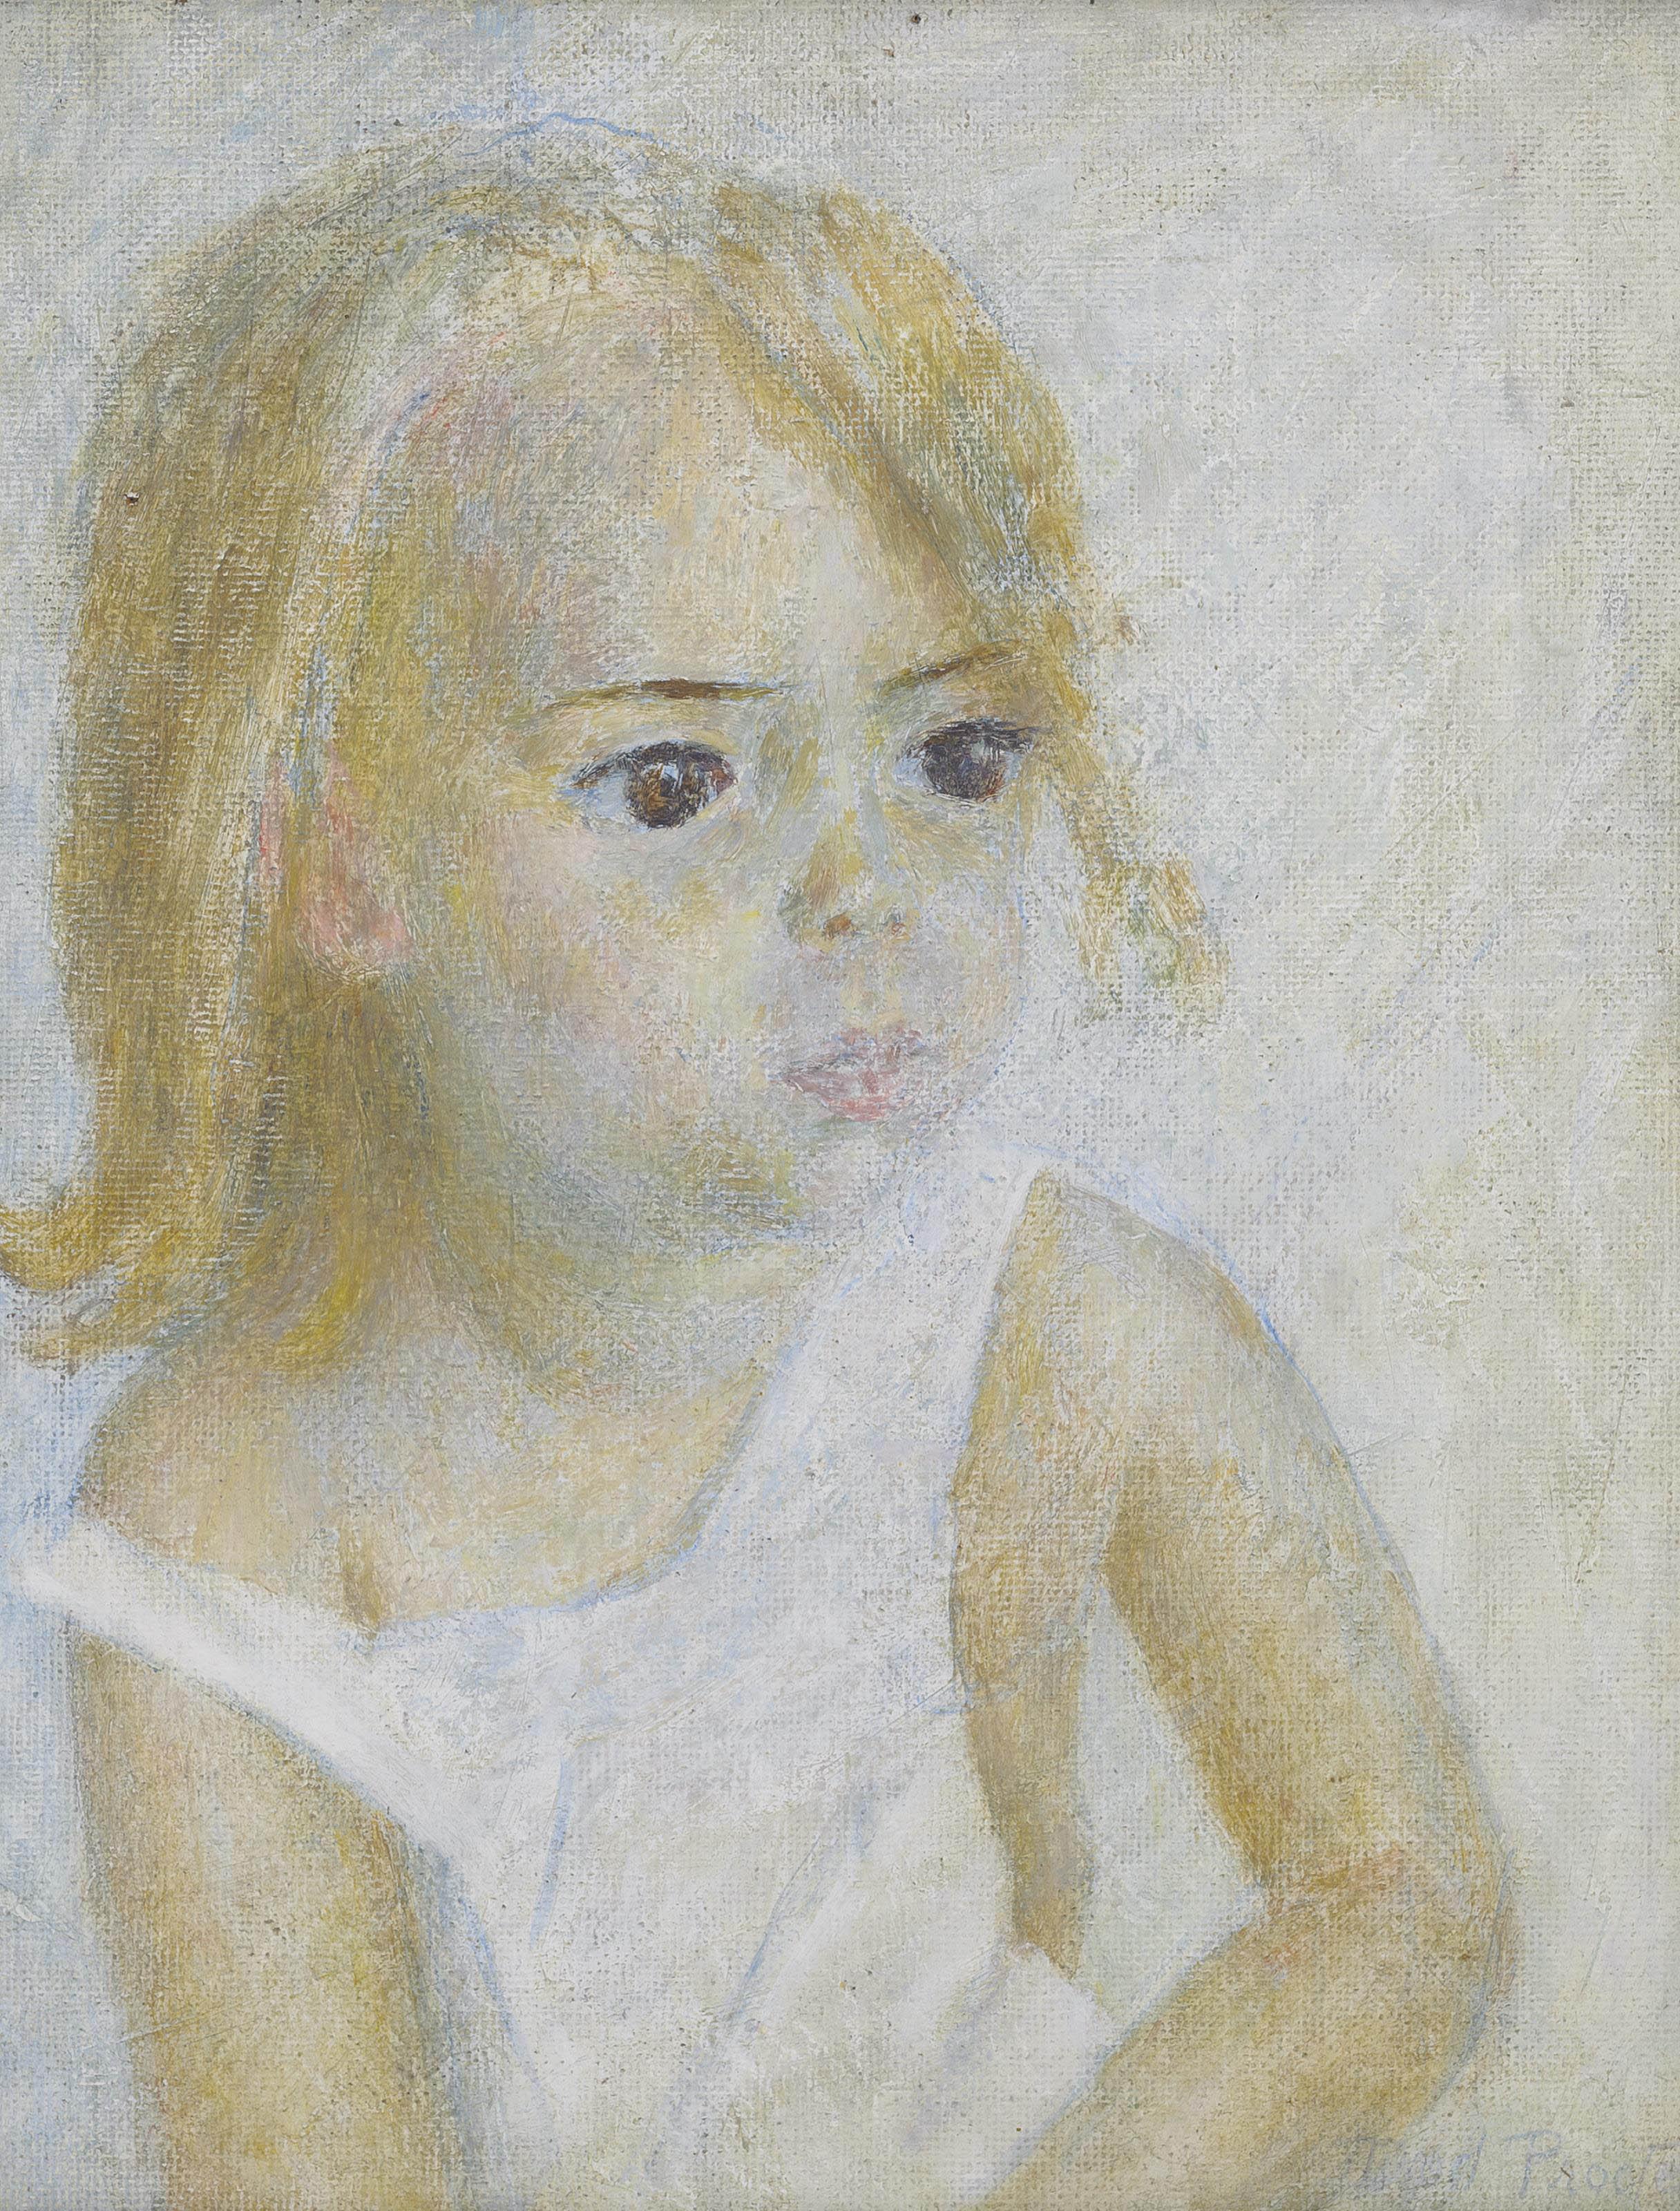 Dod Procter (1891-1972)